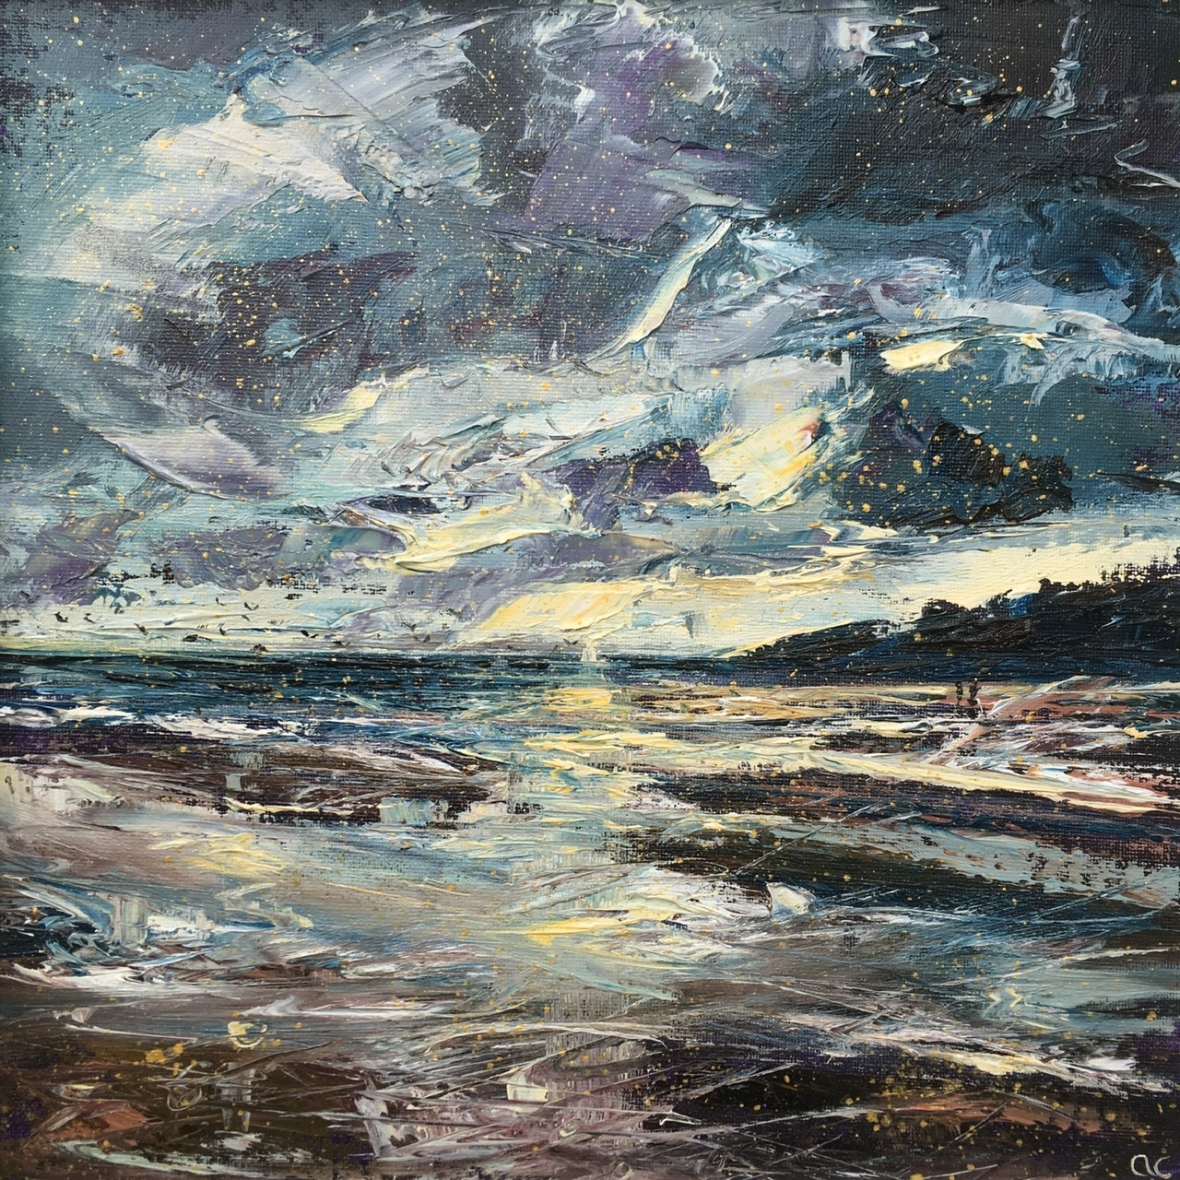 Twilight walk, oil painting by Anna Cumming